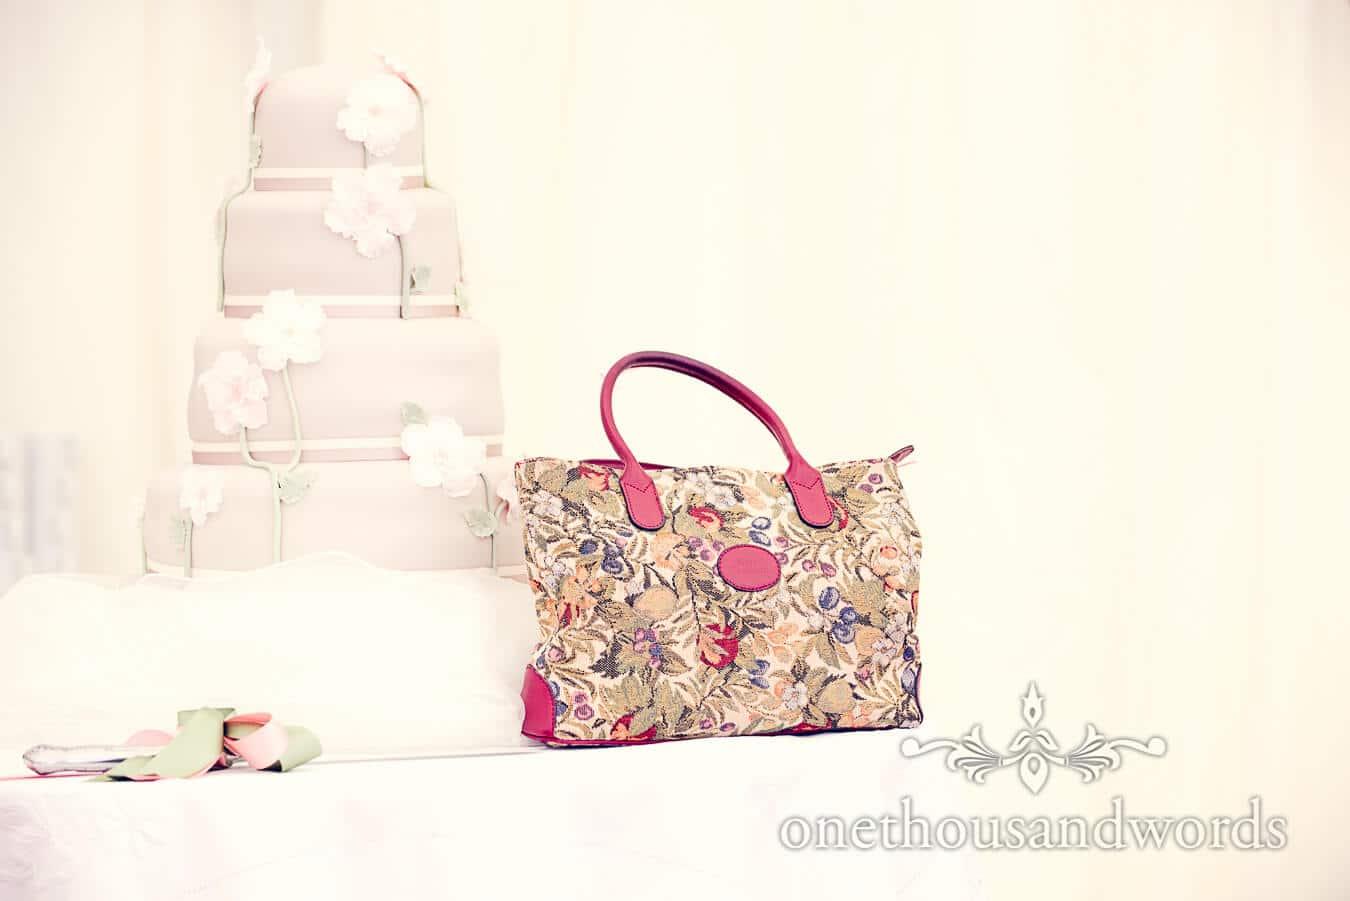 Wedding cake and floral handbag in wedding marquee